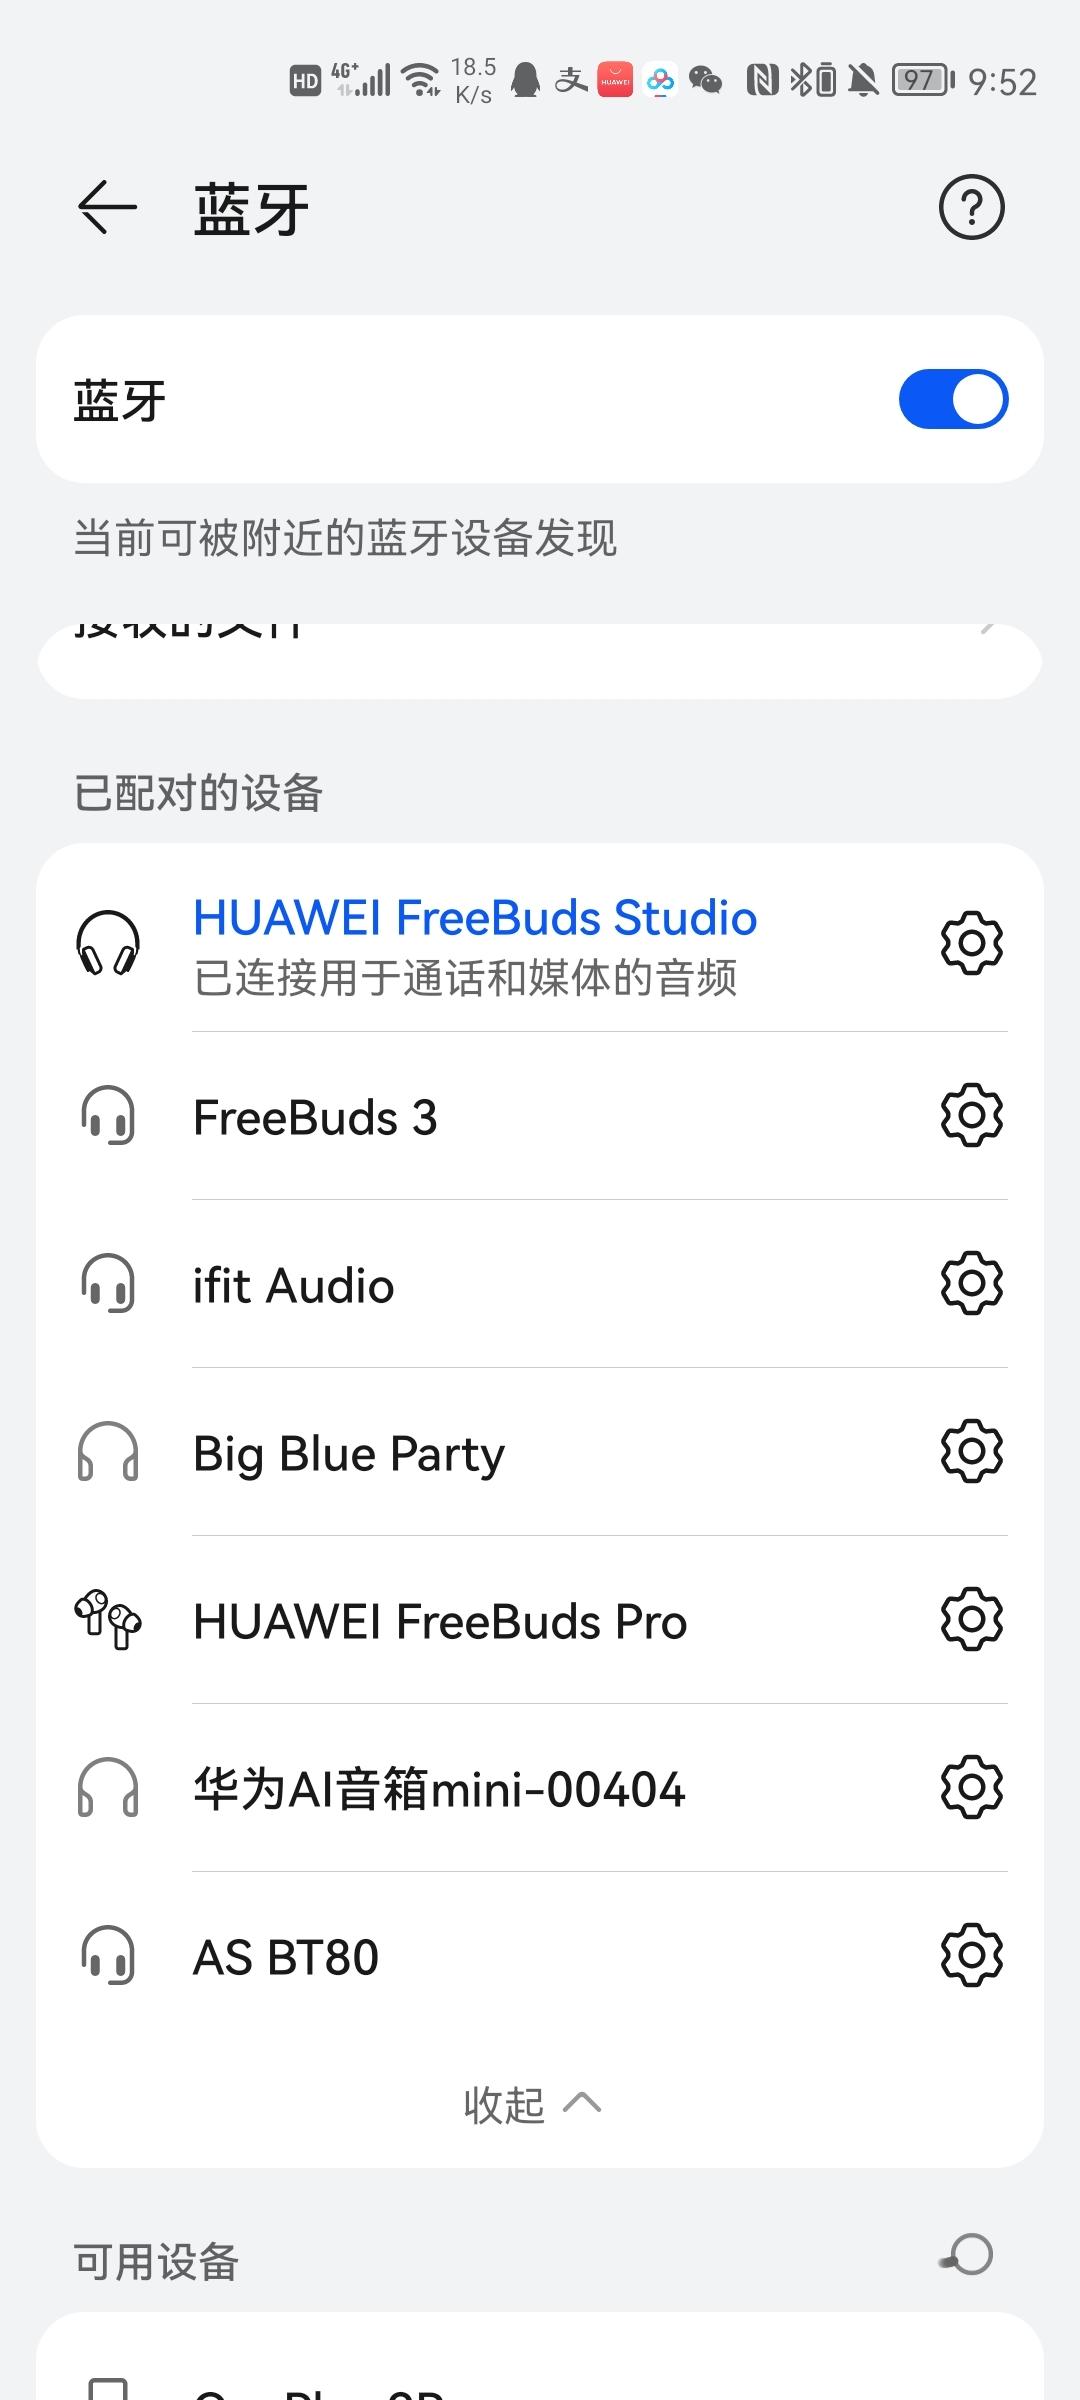 Screenshot_20210919_095219_com.android.settings.jpg